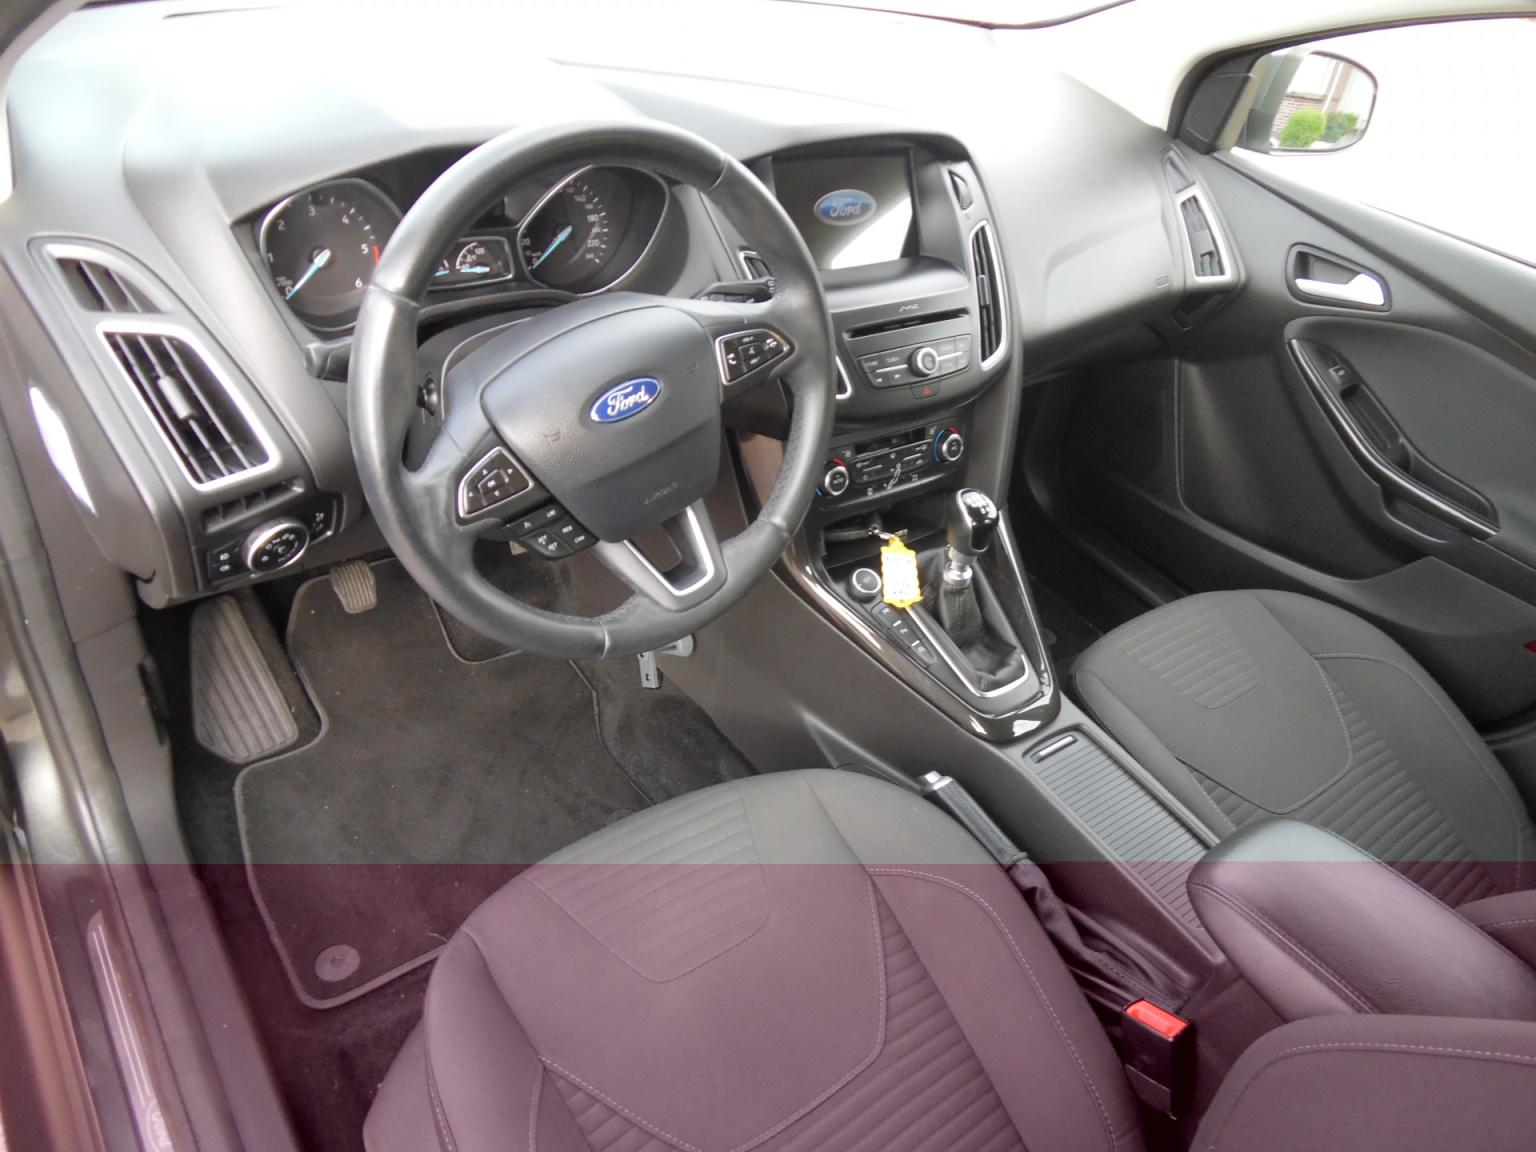 Ford-Focus-5